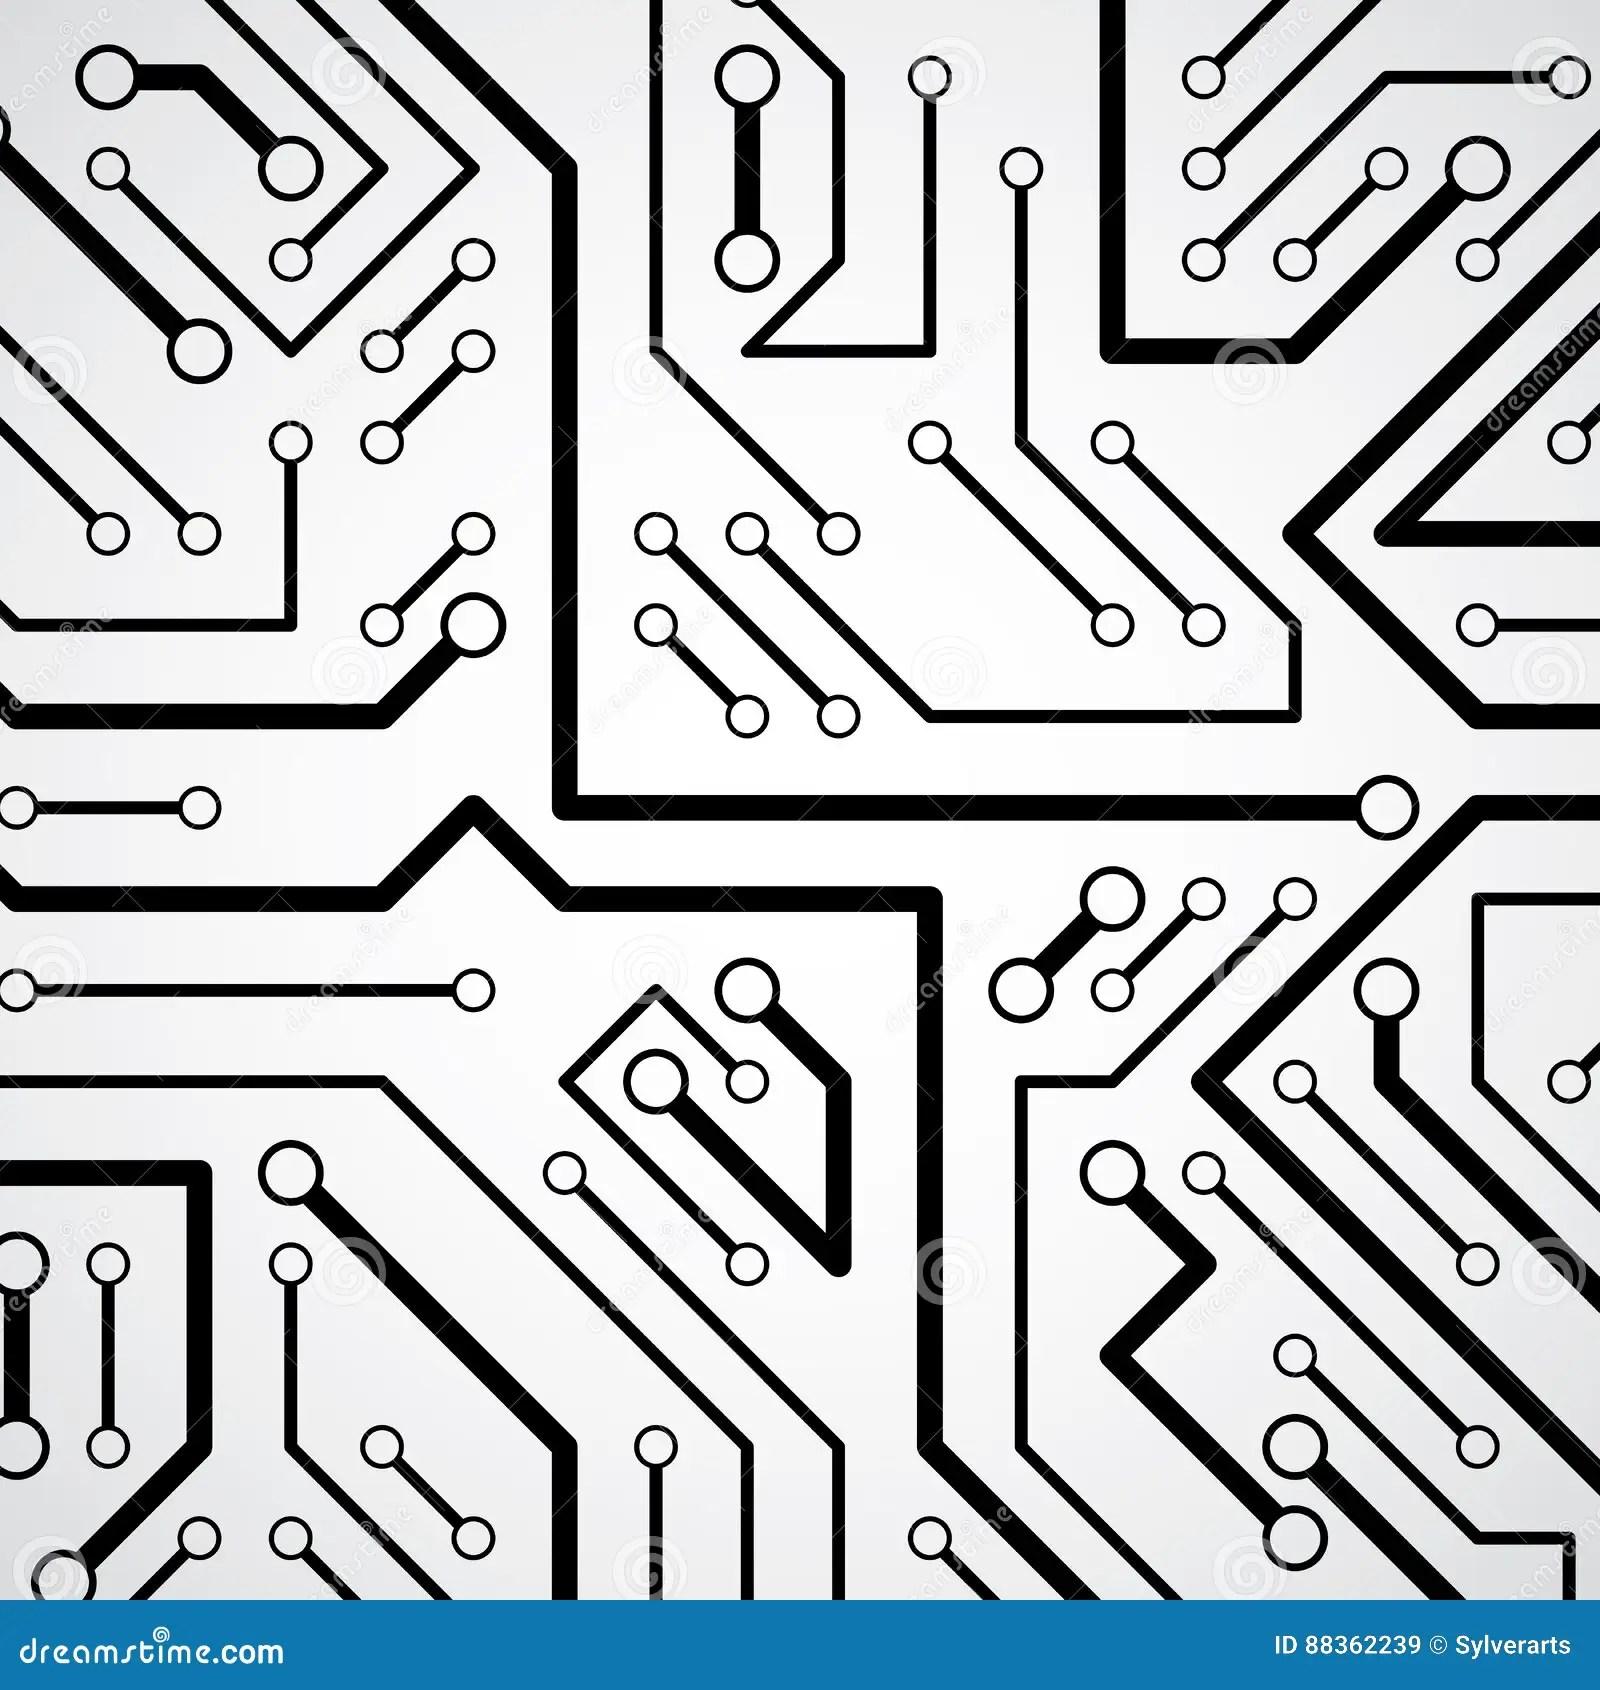 Circuit Board Futuristic Cybernetic Texture, Information